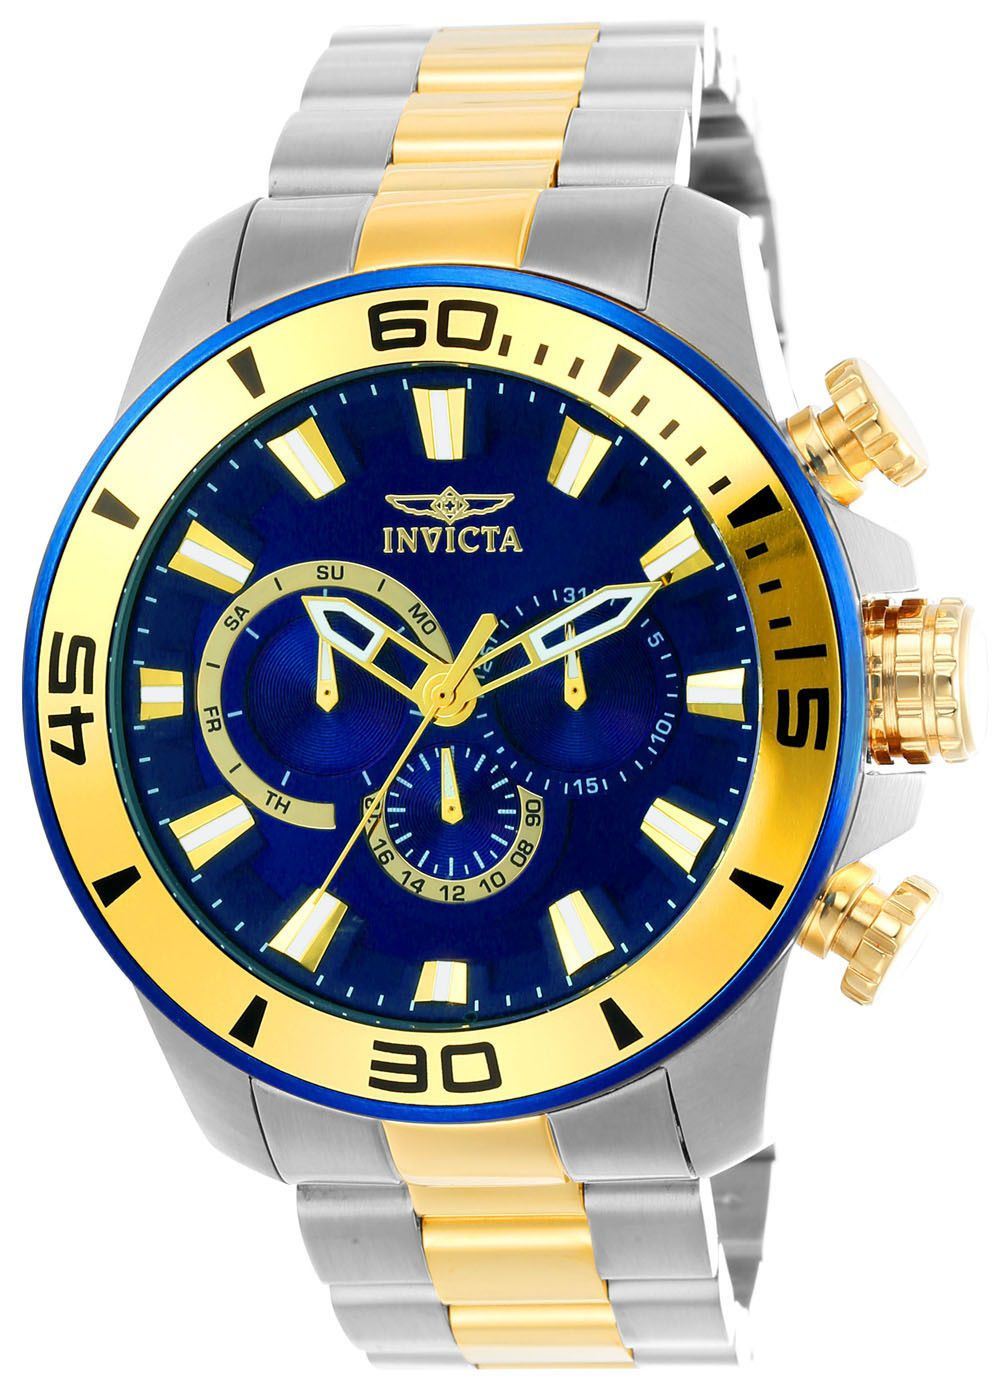 2a7f76981b6 Relógio Masculino Invicta Pro Diver 22591 49mm Prata e Dourado (Cor Interna  da Caixa Azul)